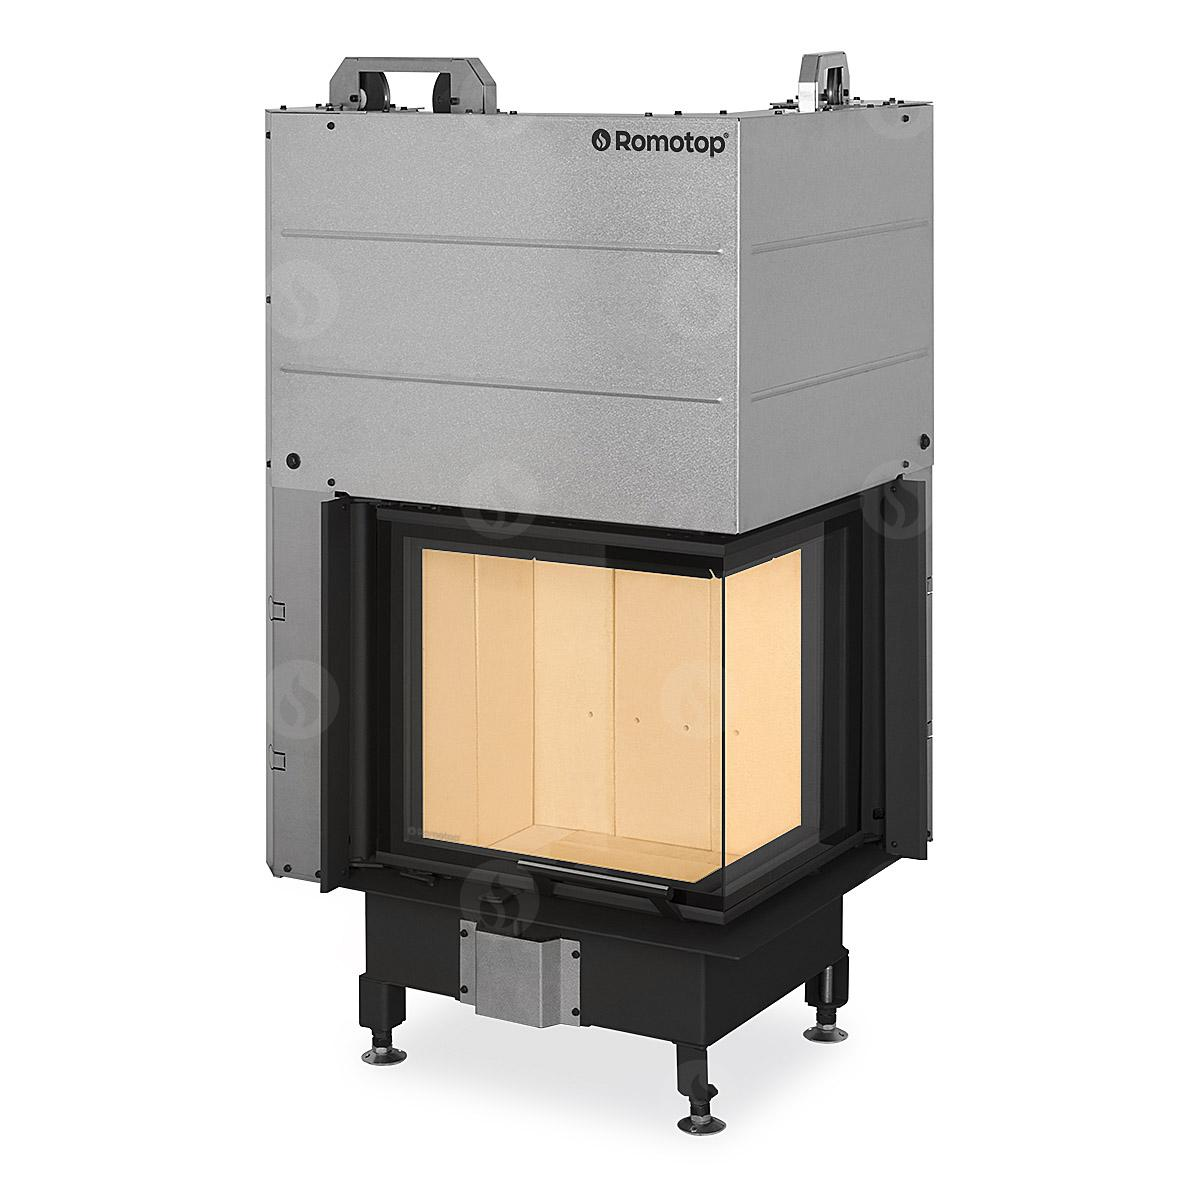 Romotop Heat 3 G L 50 51 40 21 Lewy lub Prawy